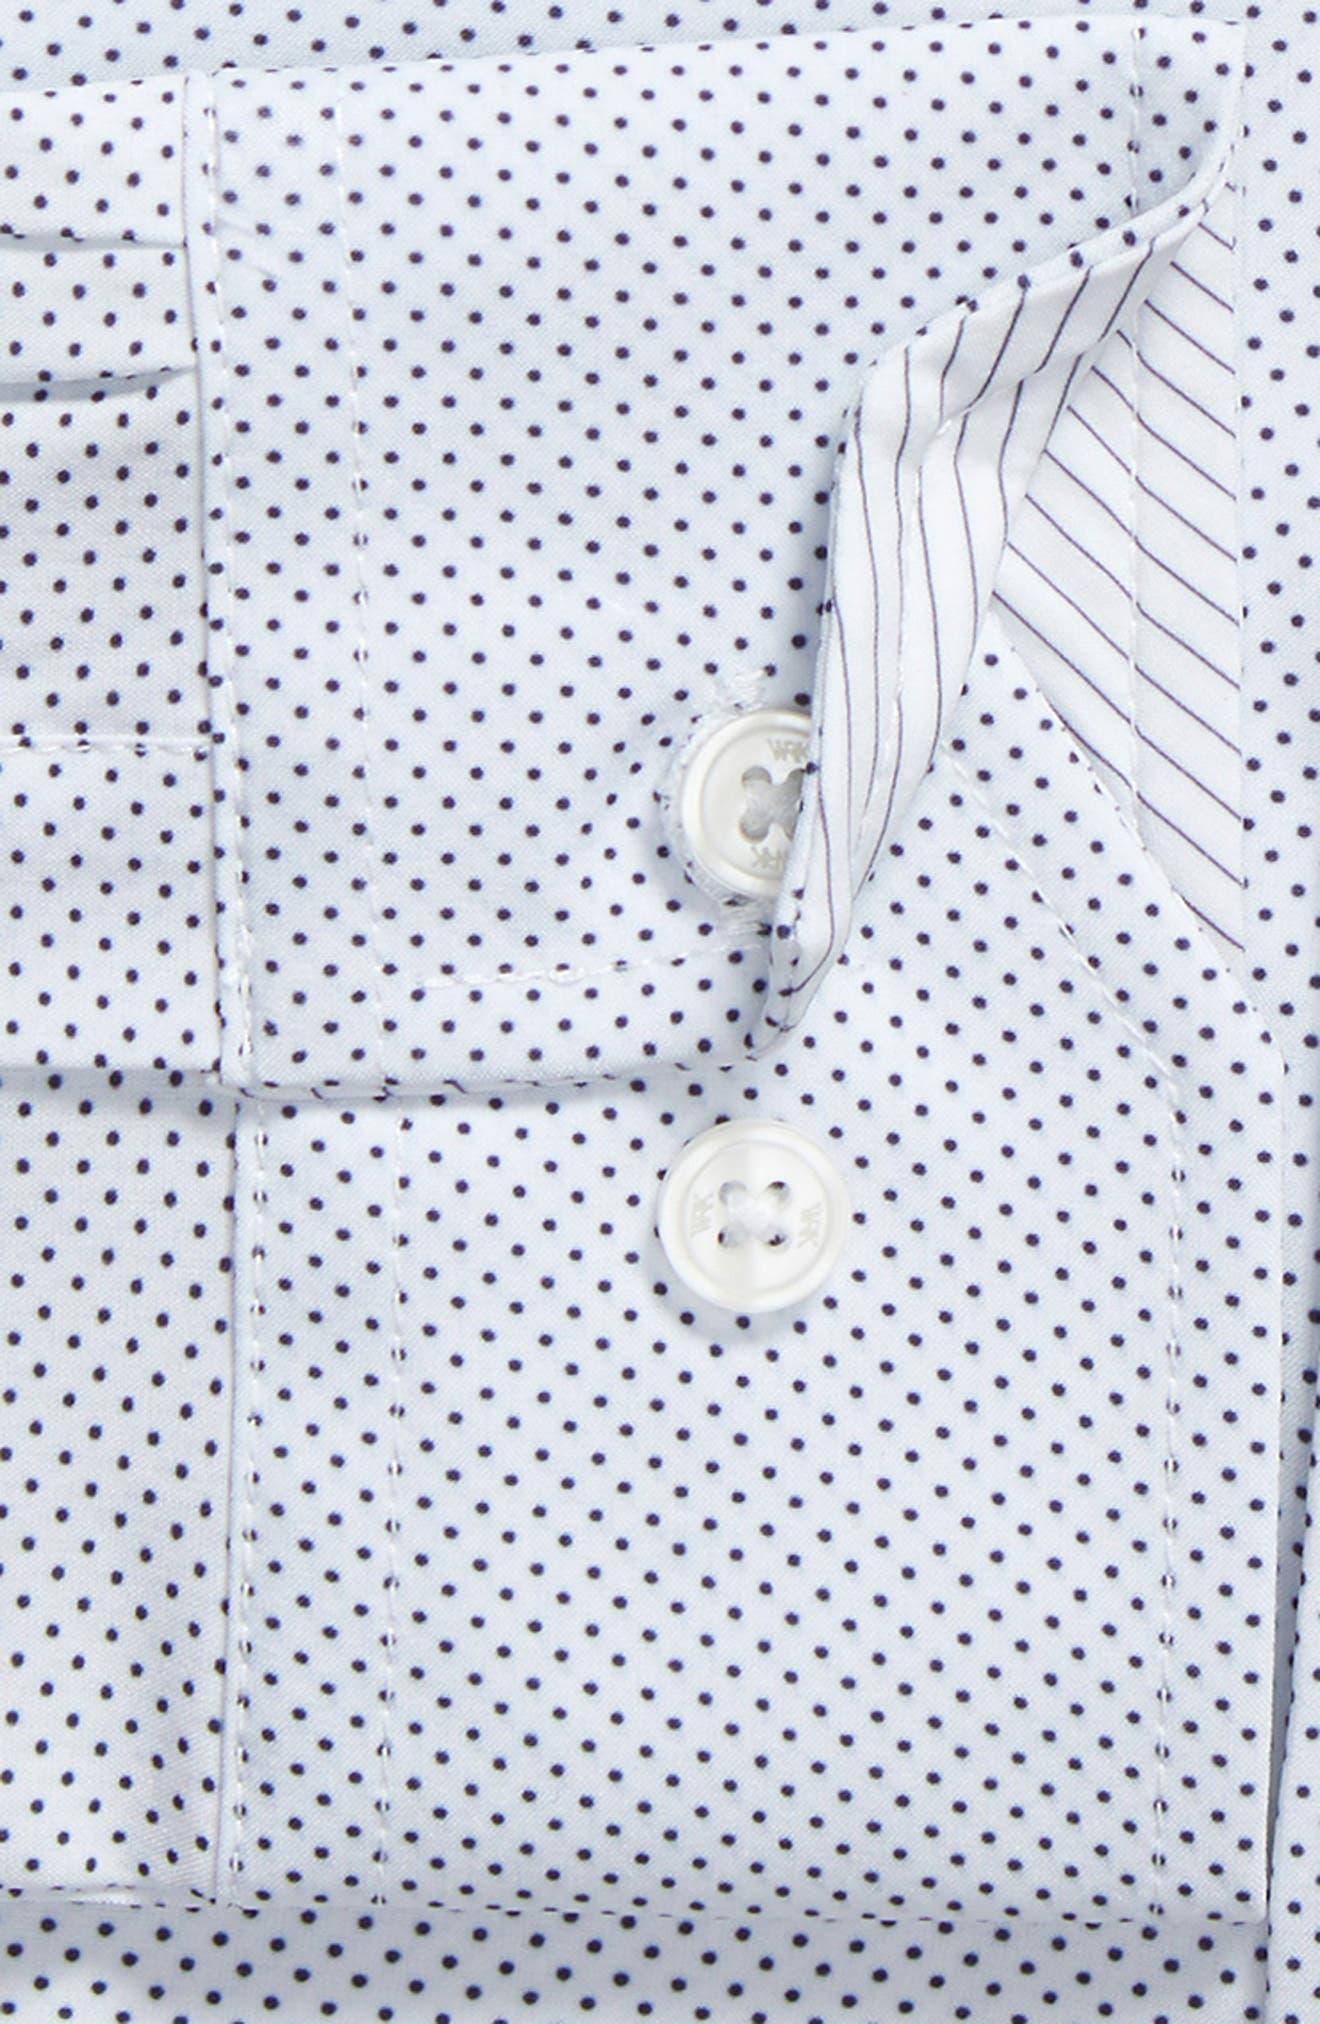 W.R.K,                             Trim Fit Dot 4-Way Stretch Dress Shirt,                             Alternate thumbnail 6, color,                             100